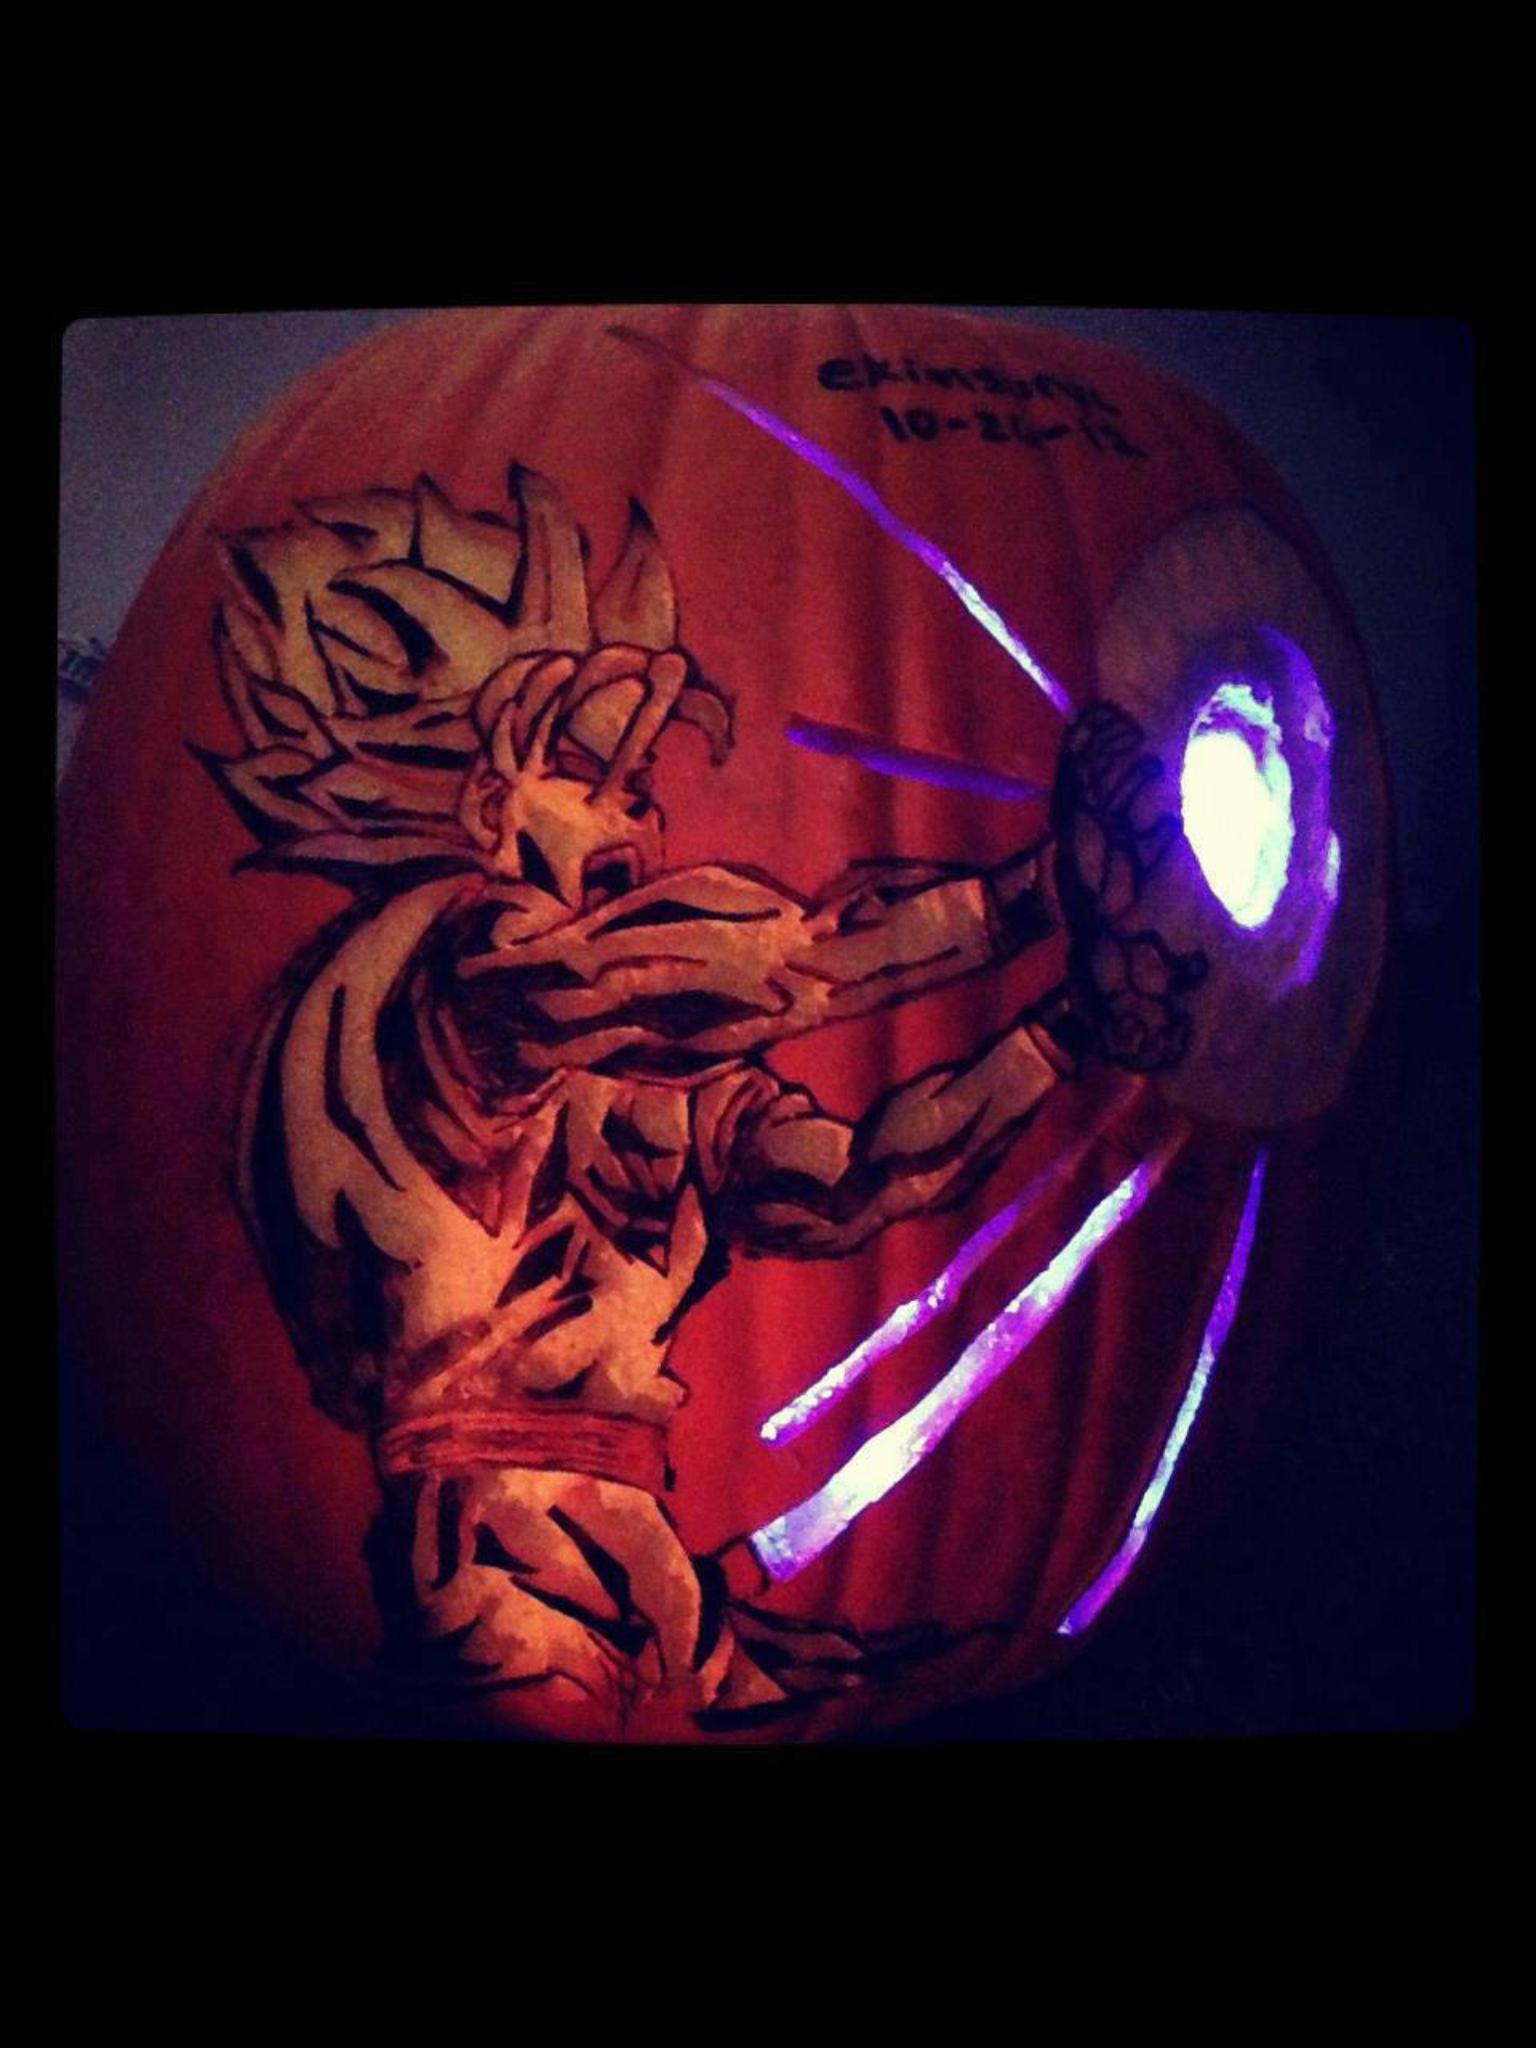 Vegeta Pumpkin Carving: Goku's Kamehameha Wave Pumpkin Carving.